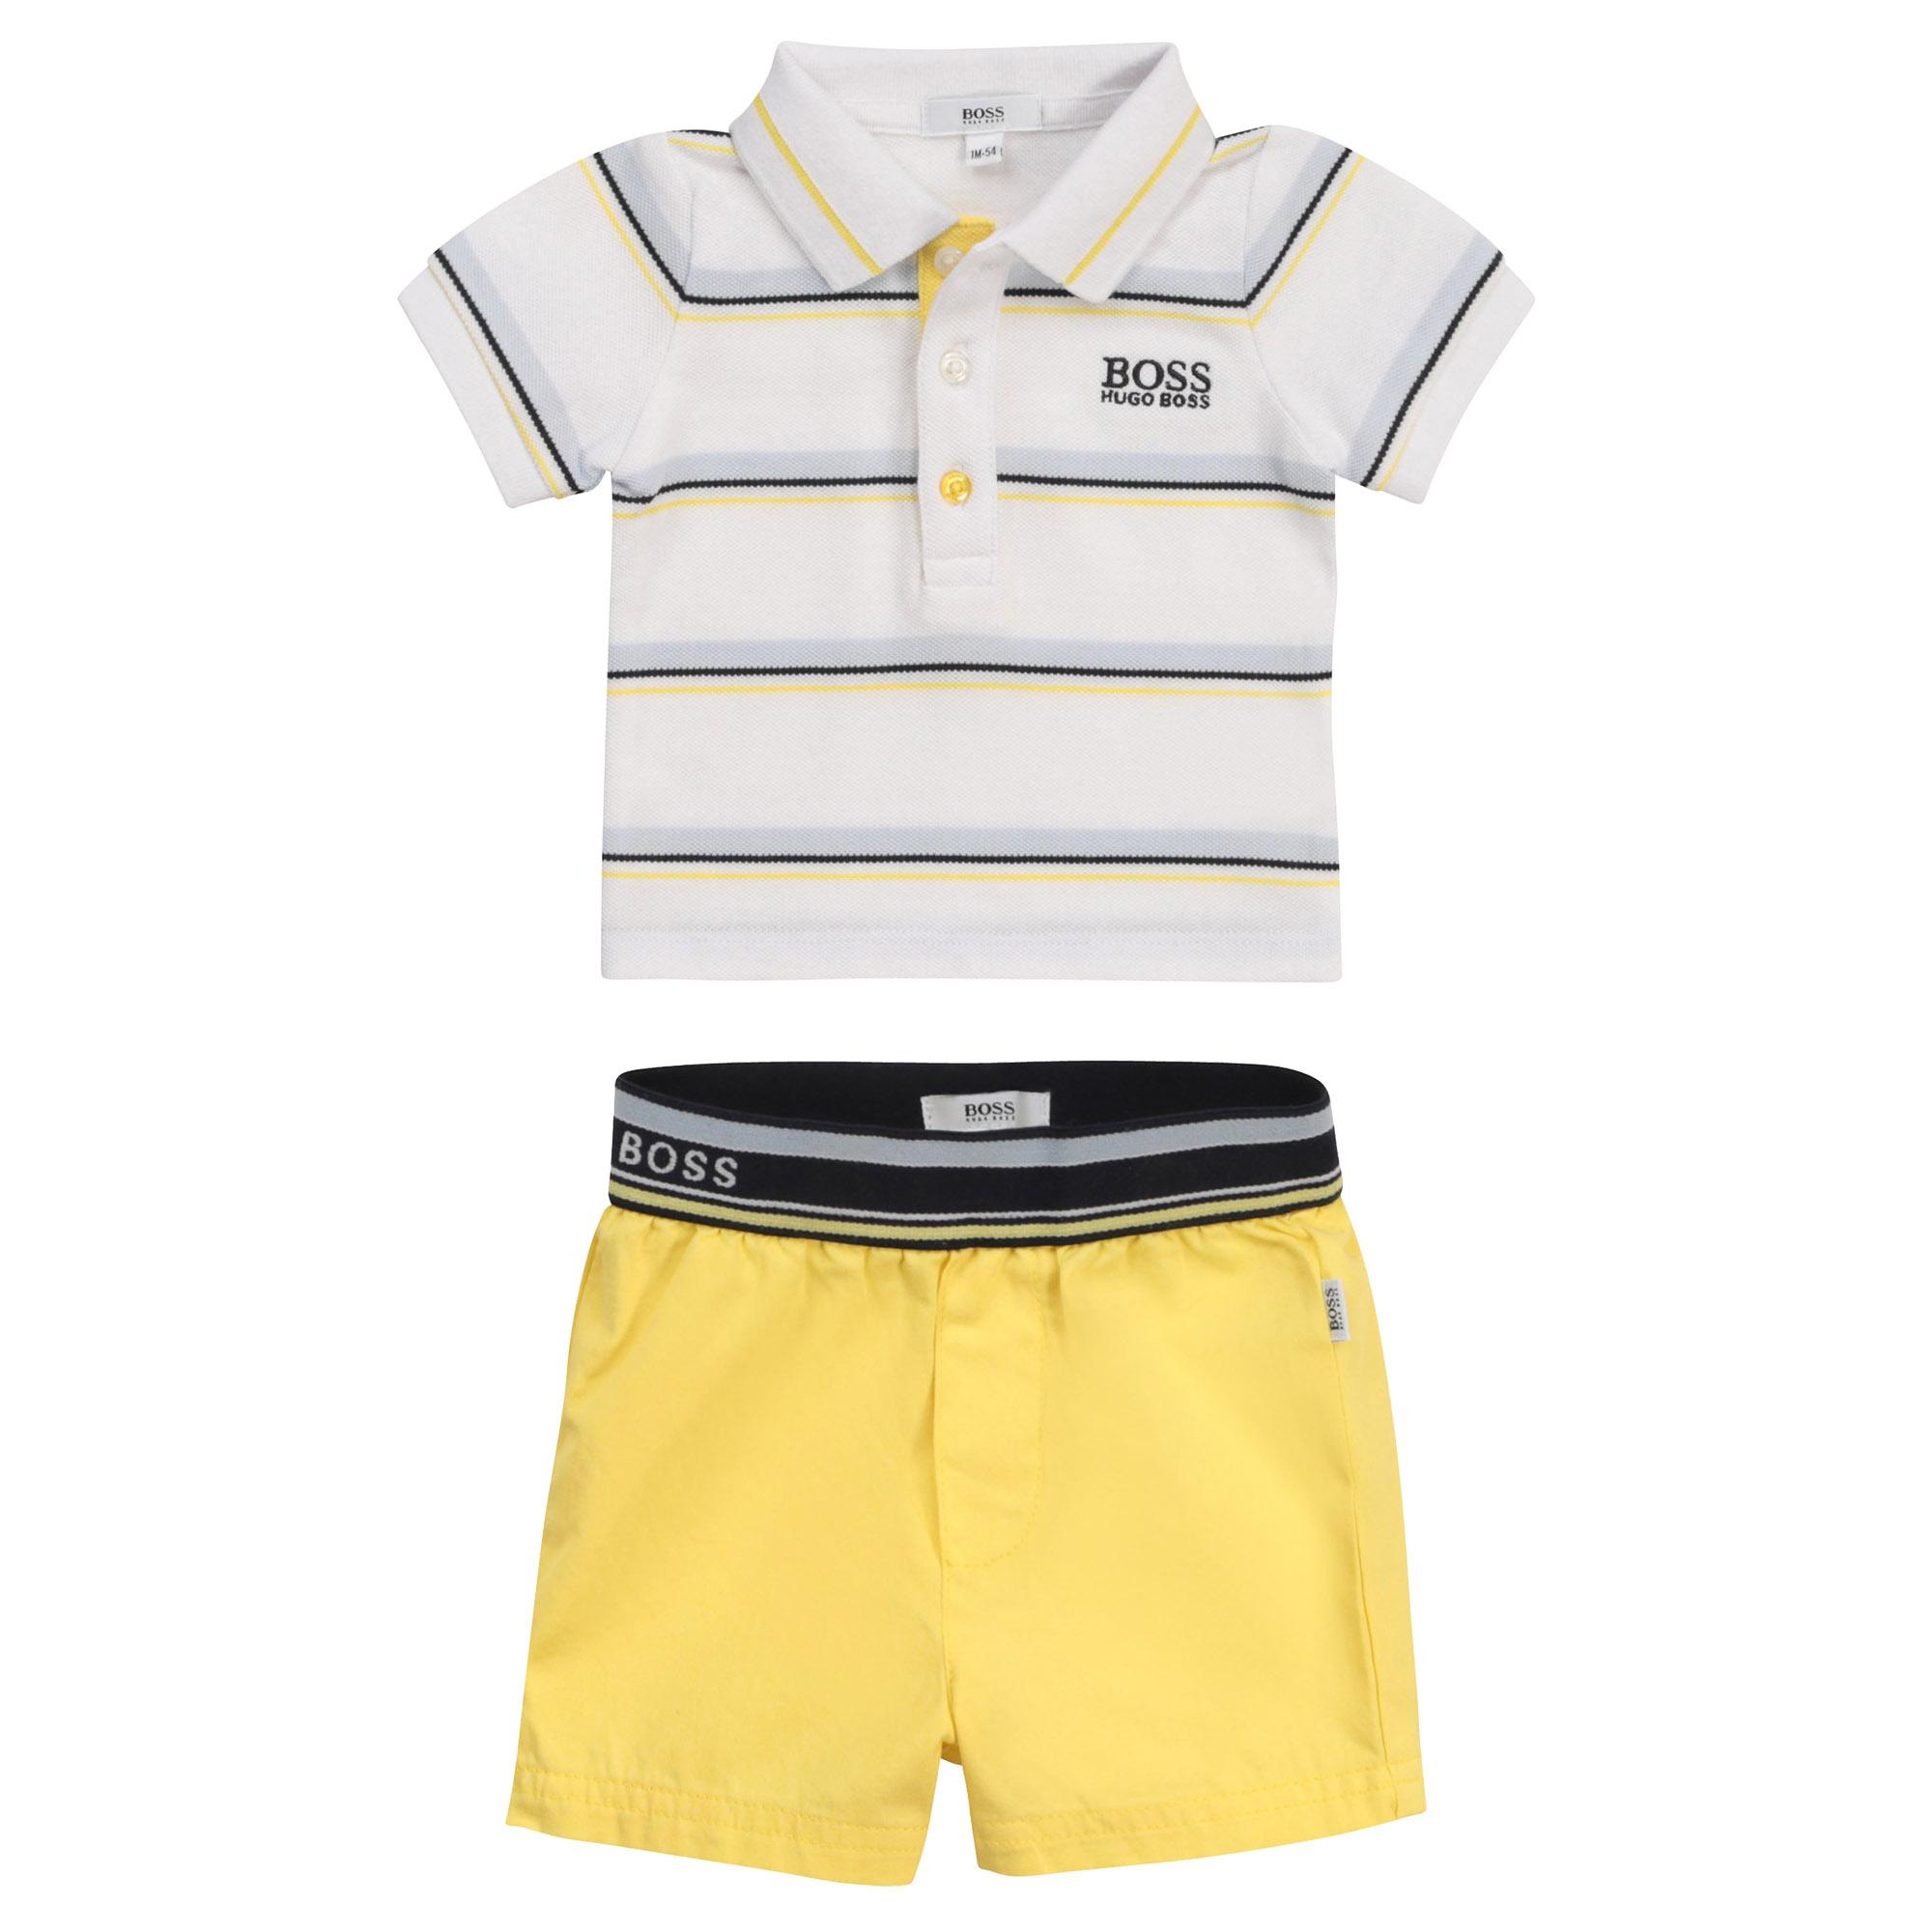 Polo + Bermuda shorts set BOSS for BOY